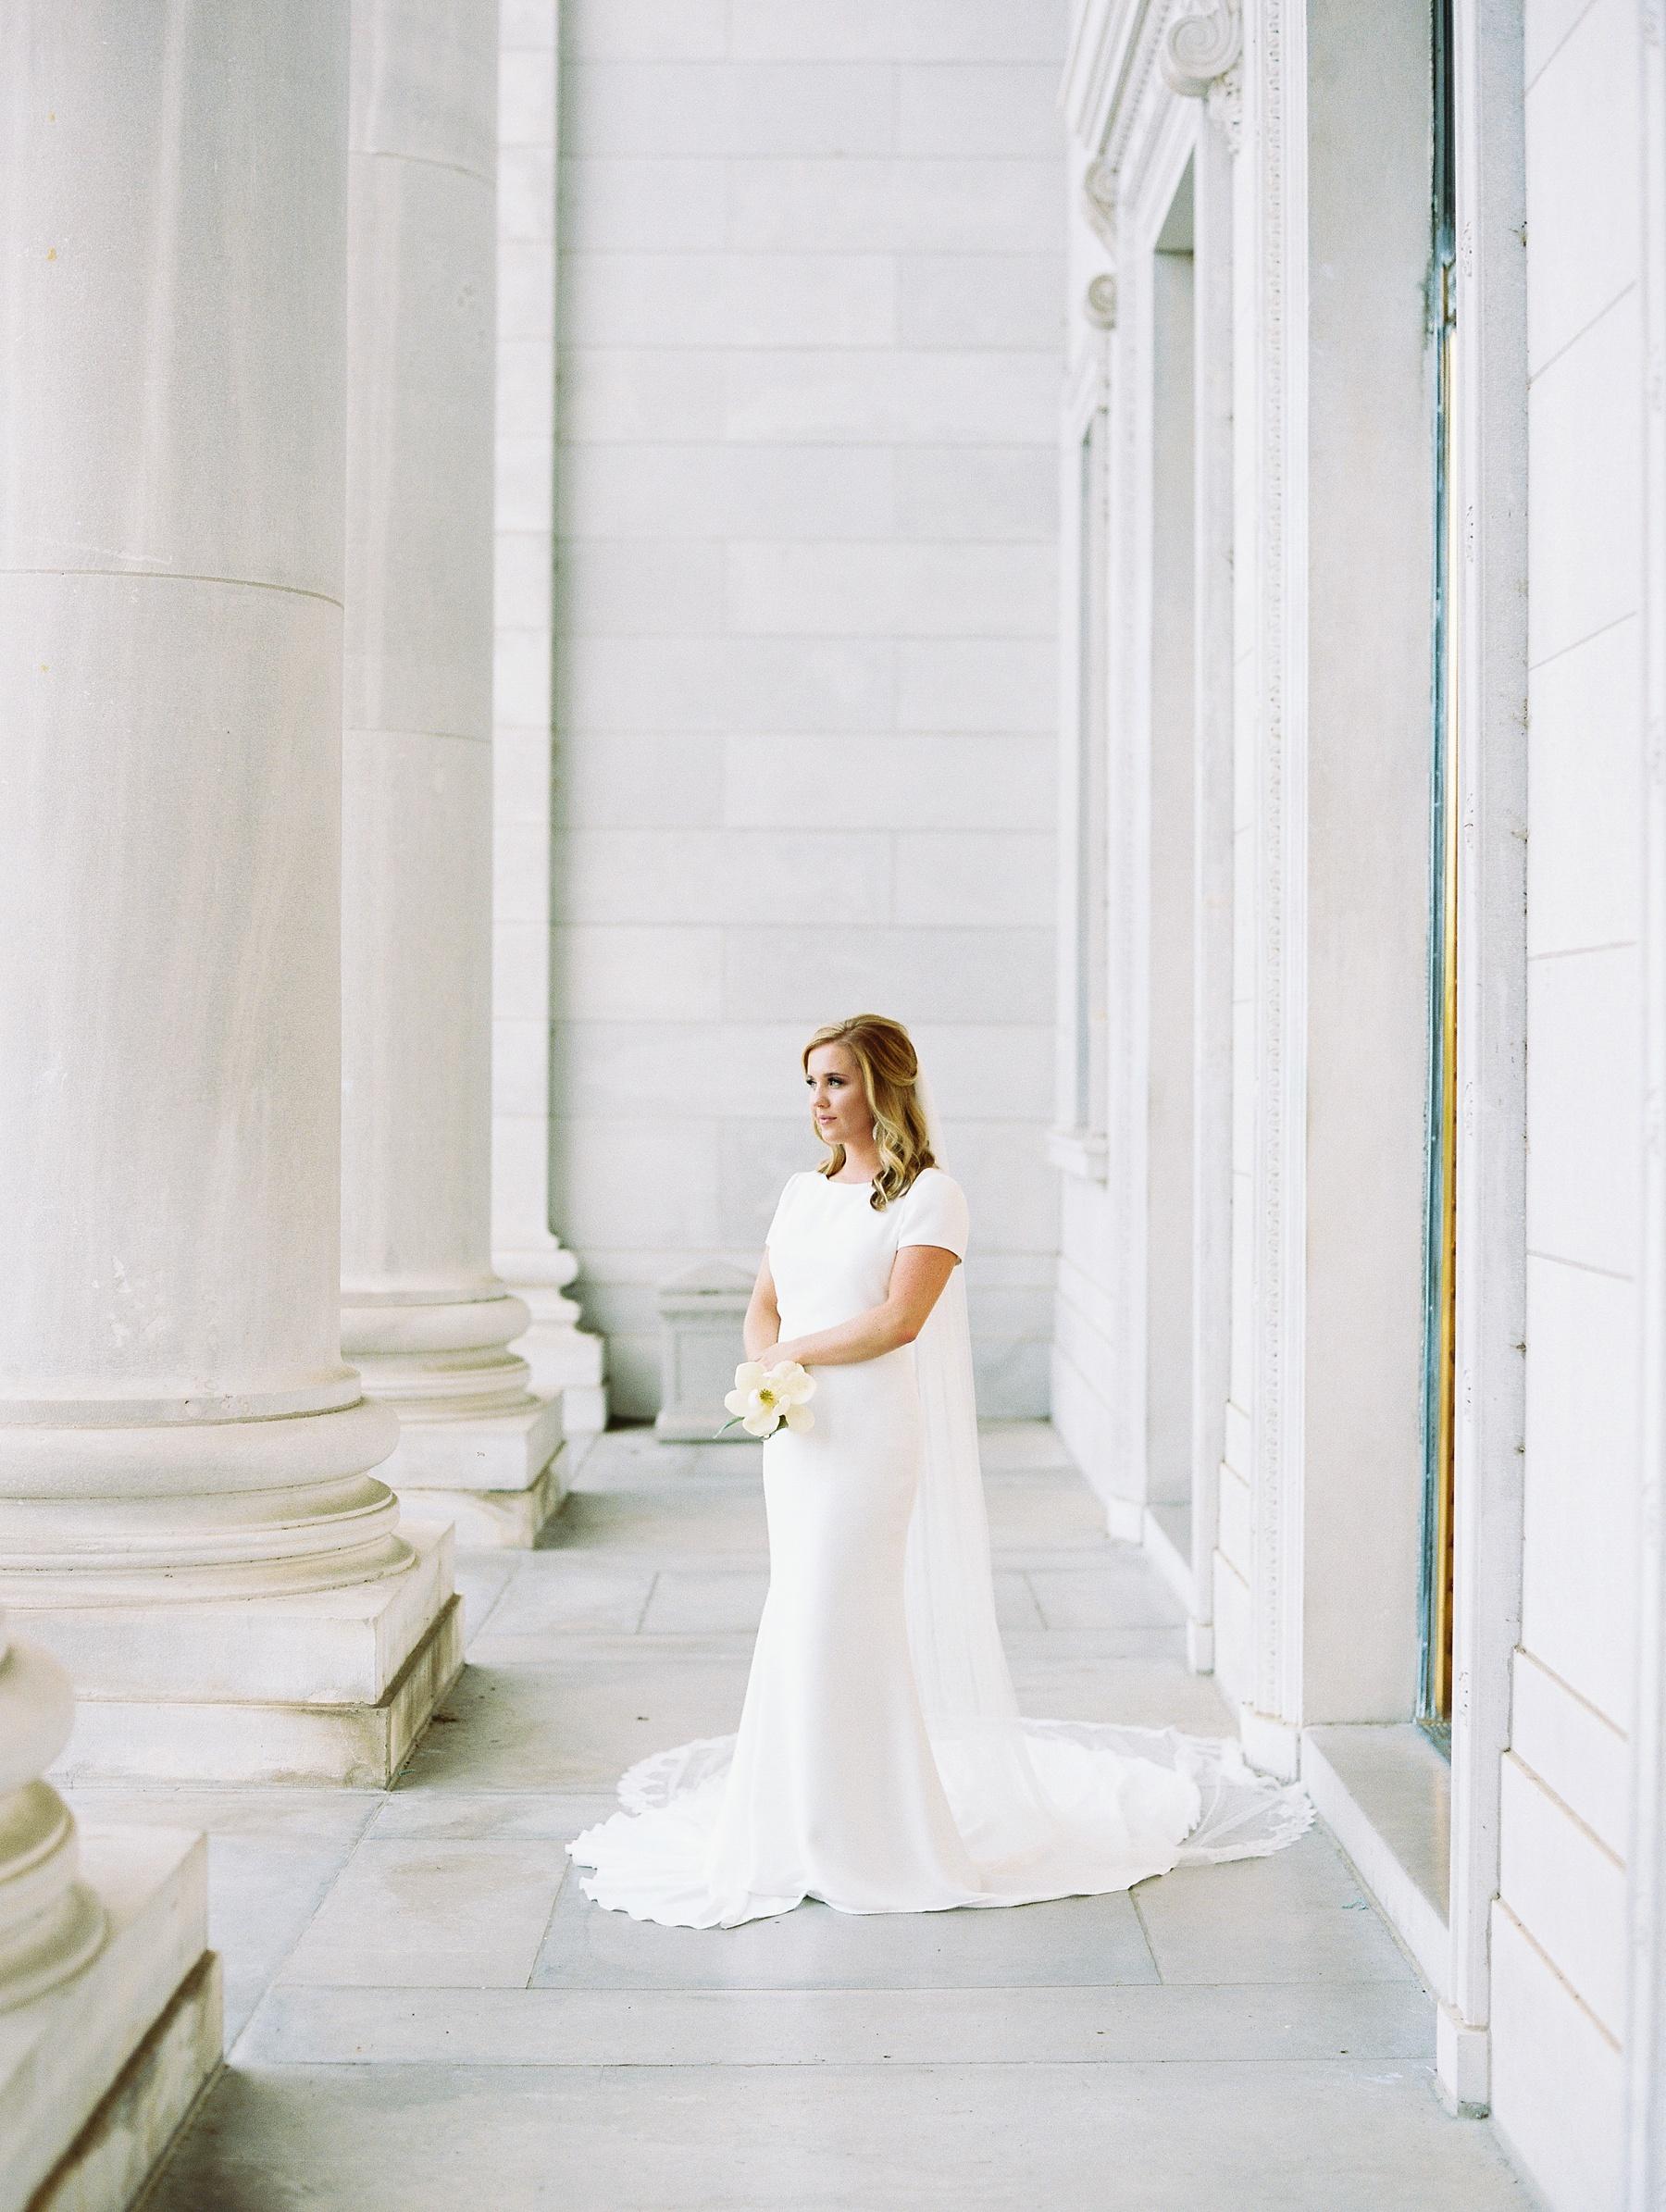 Arkansas Capitol Building Bridals Wedding Photographer_0108.jpg